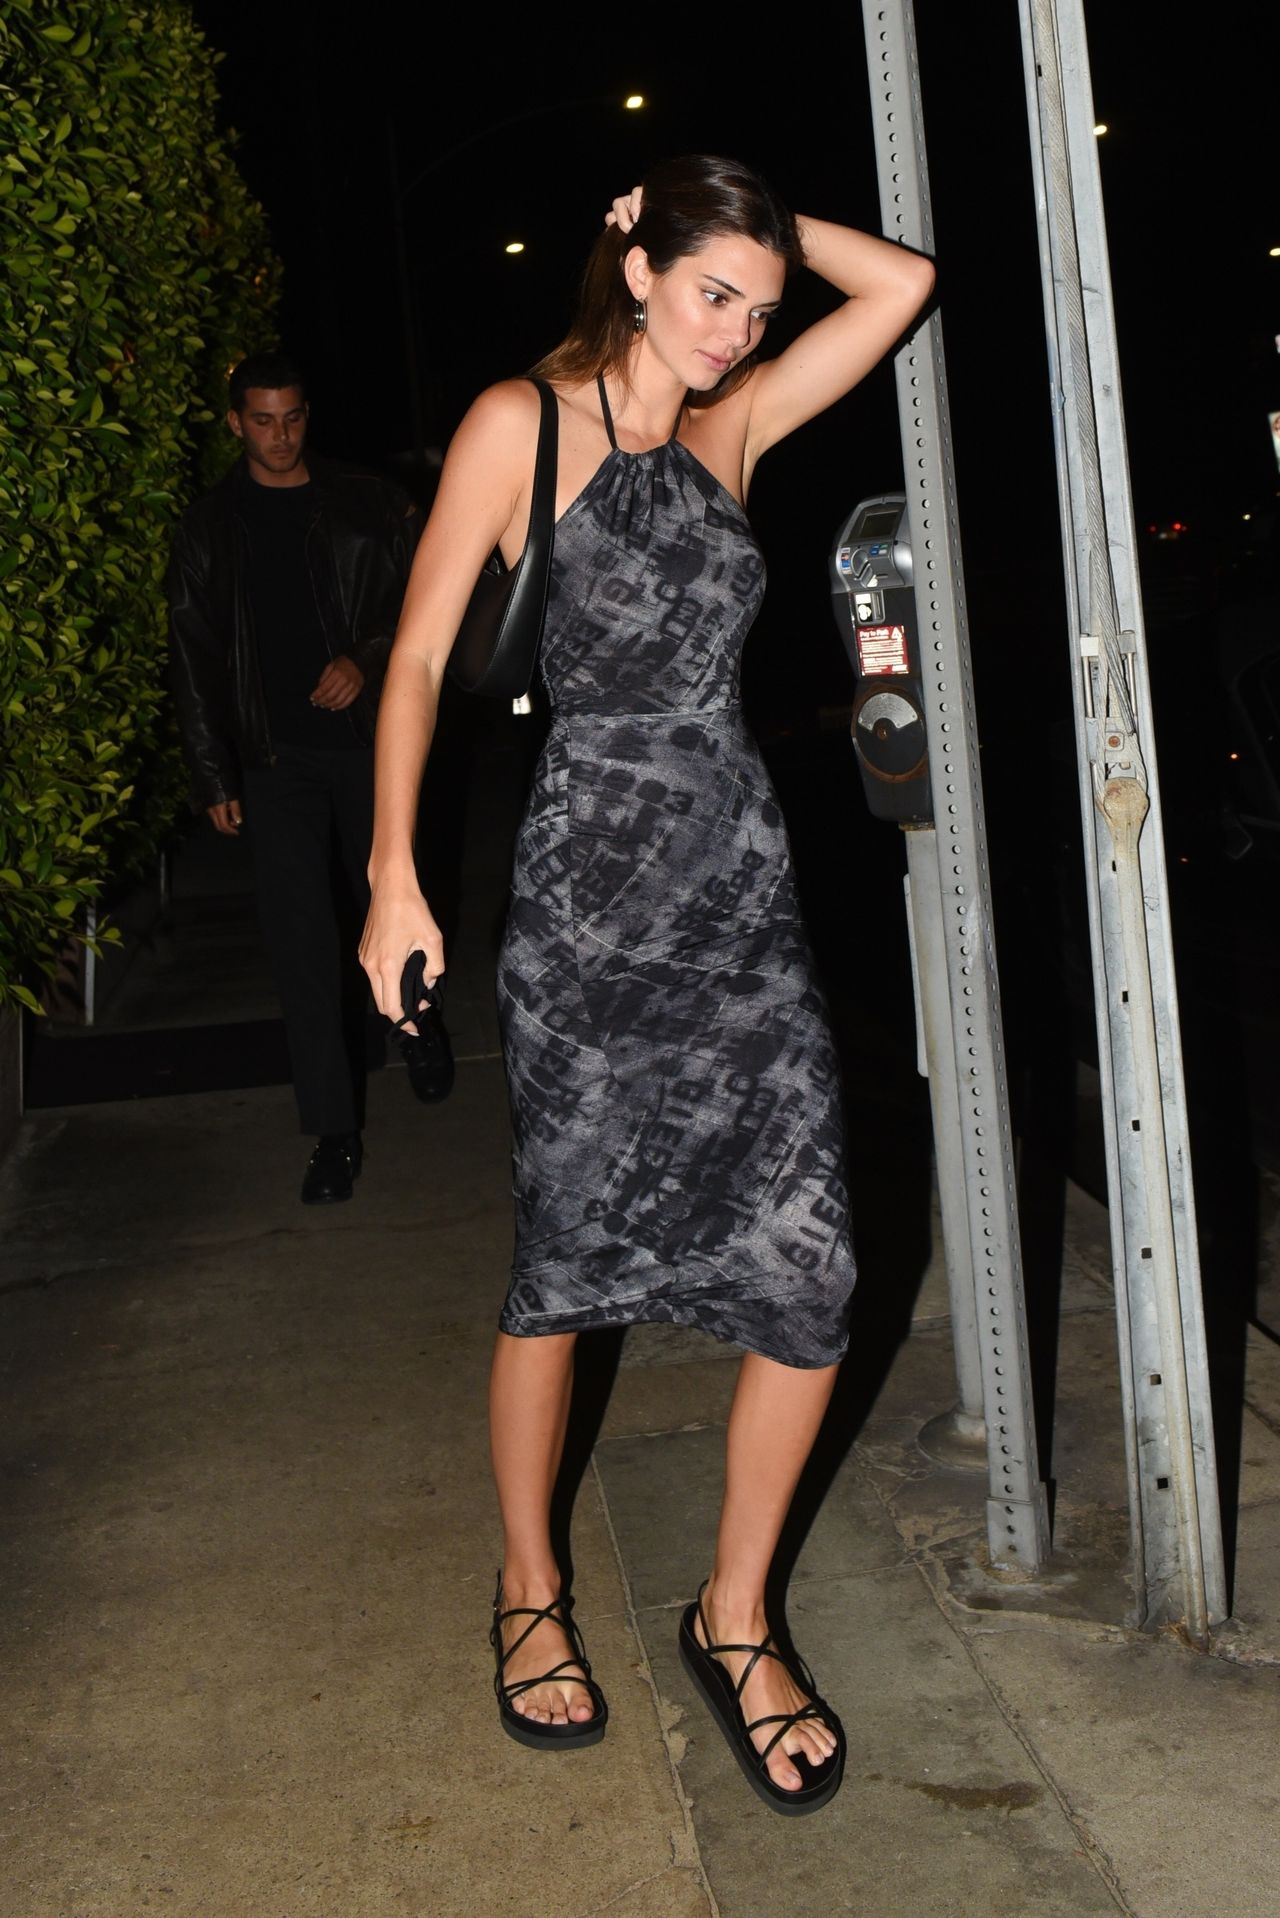 Kendall Jenner w obcisłej sukience i sandałach